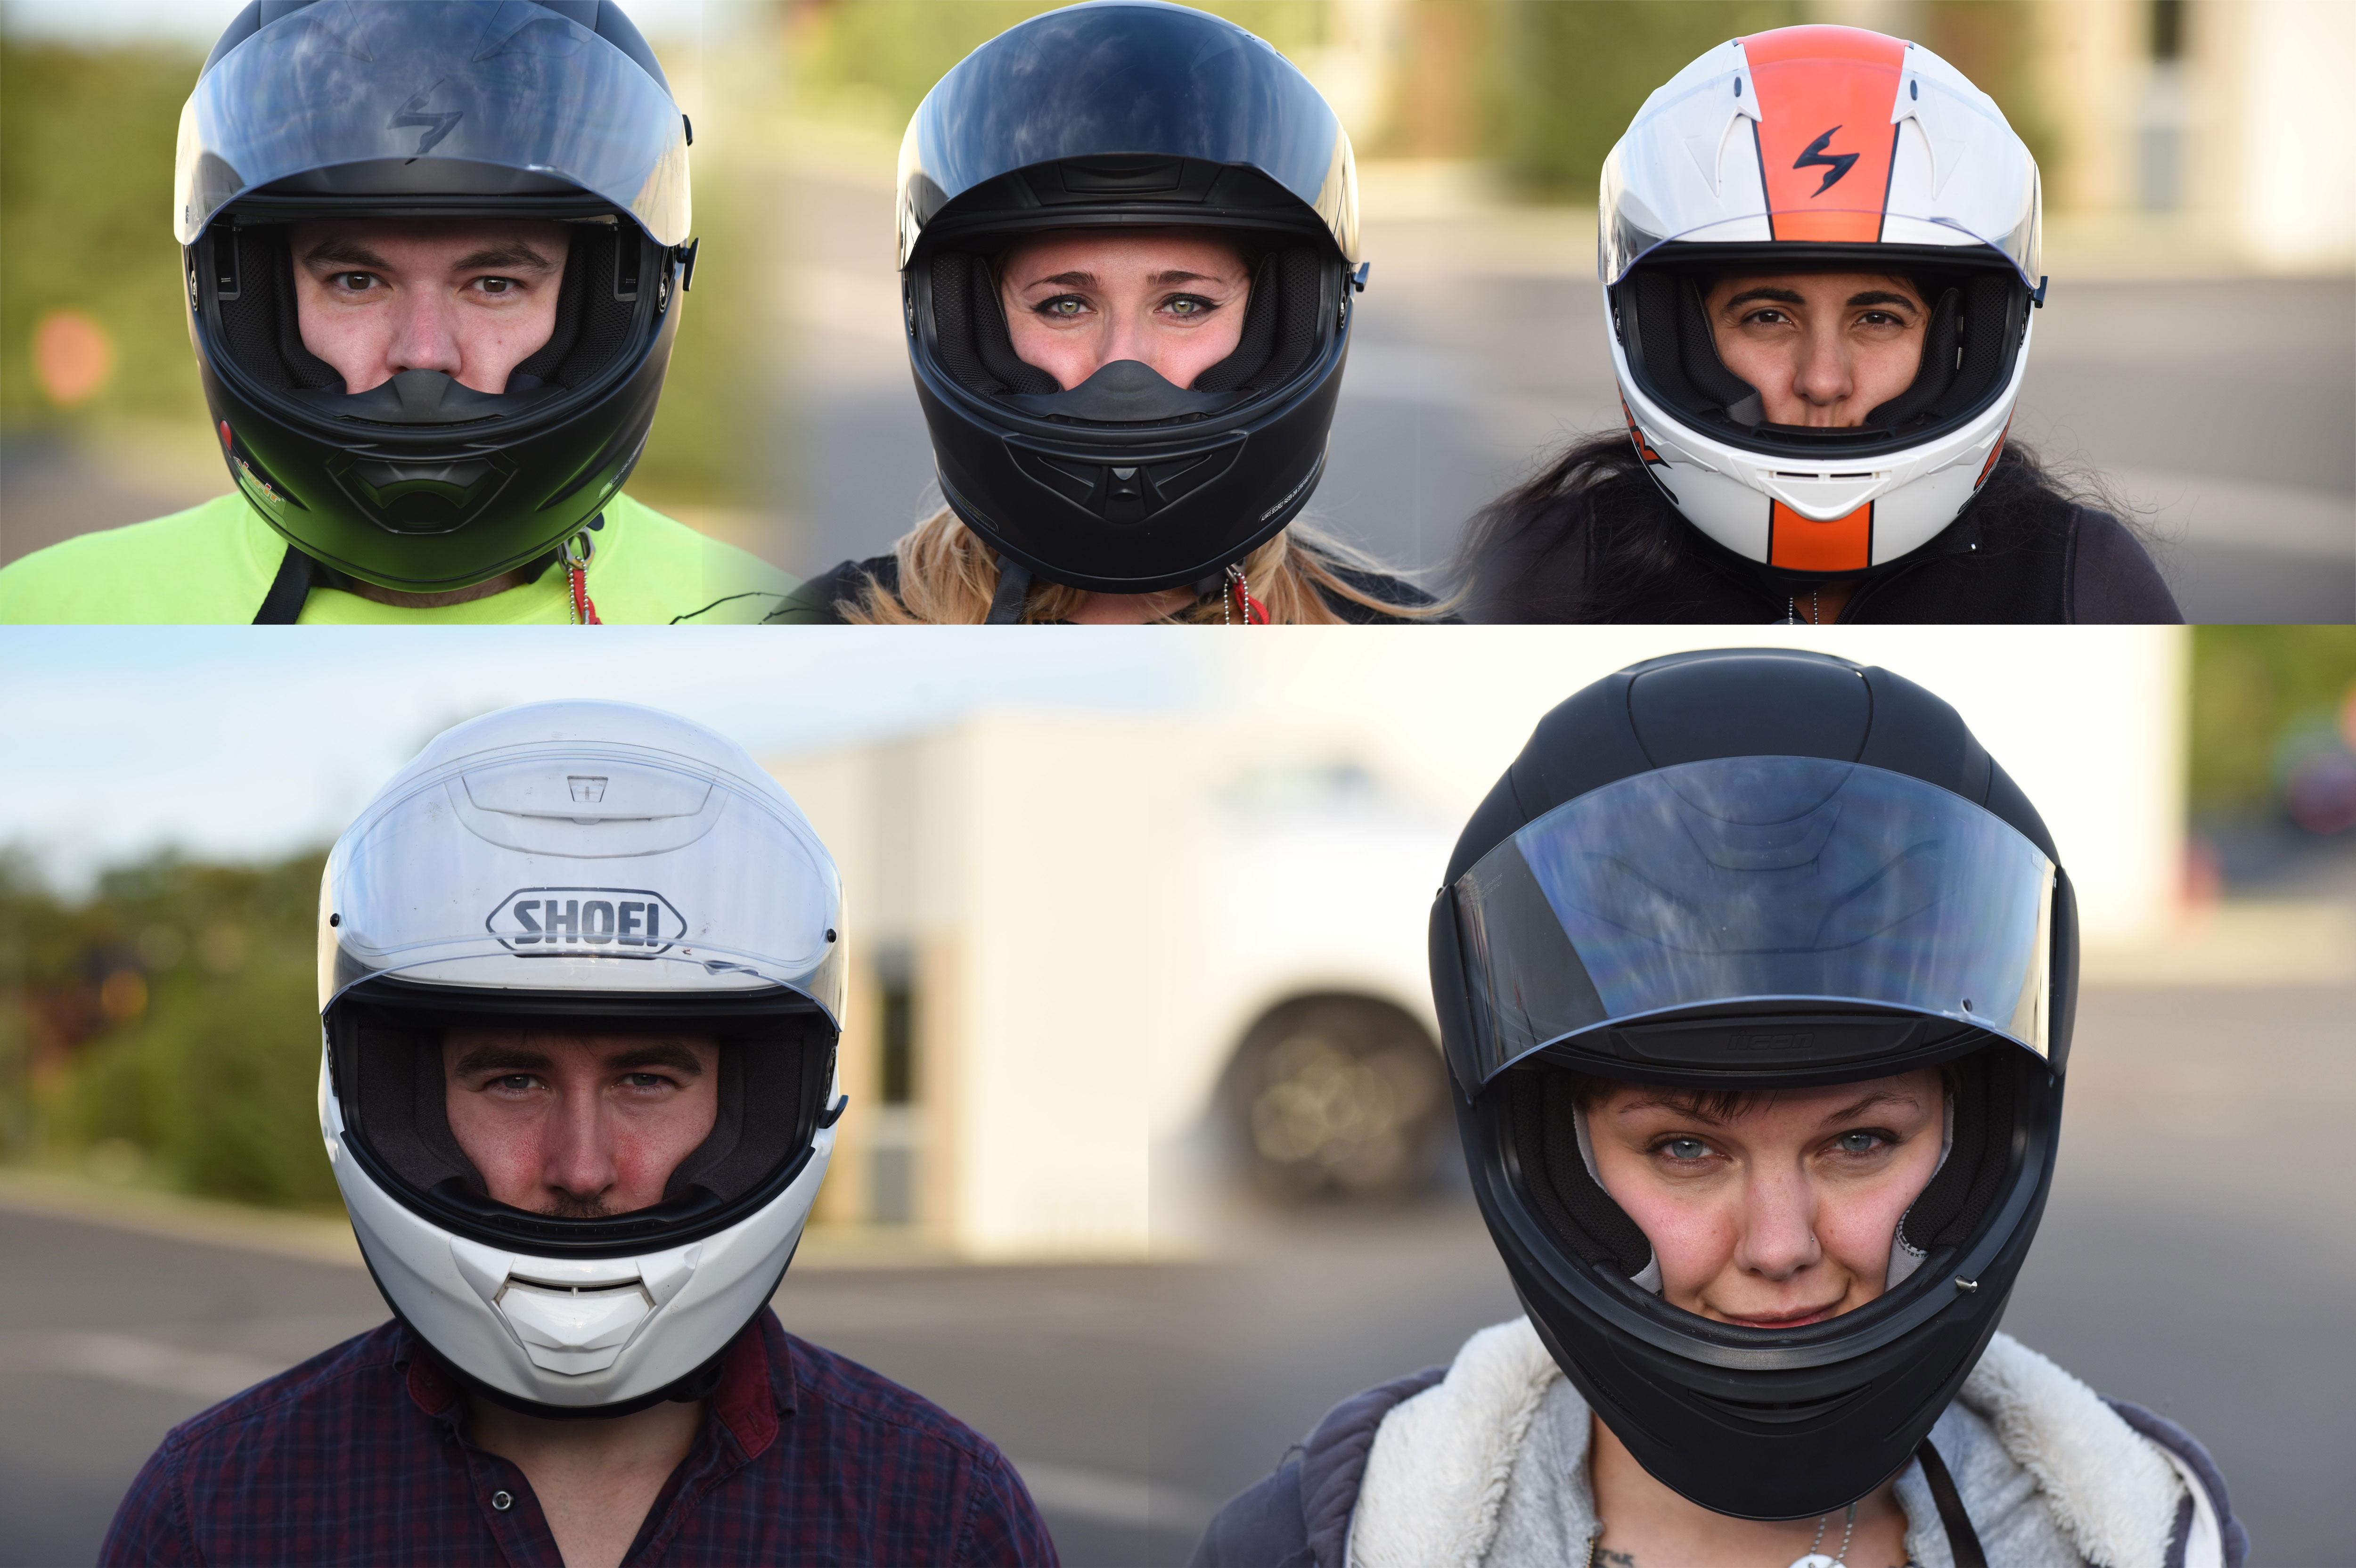 f69cf6f1416 Motorcycle Helmet Fitment 101 - RevZilla